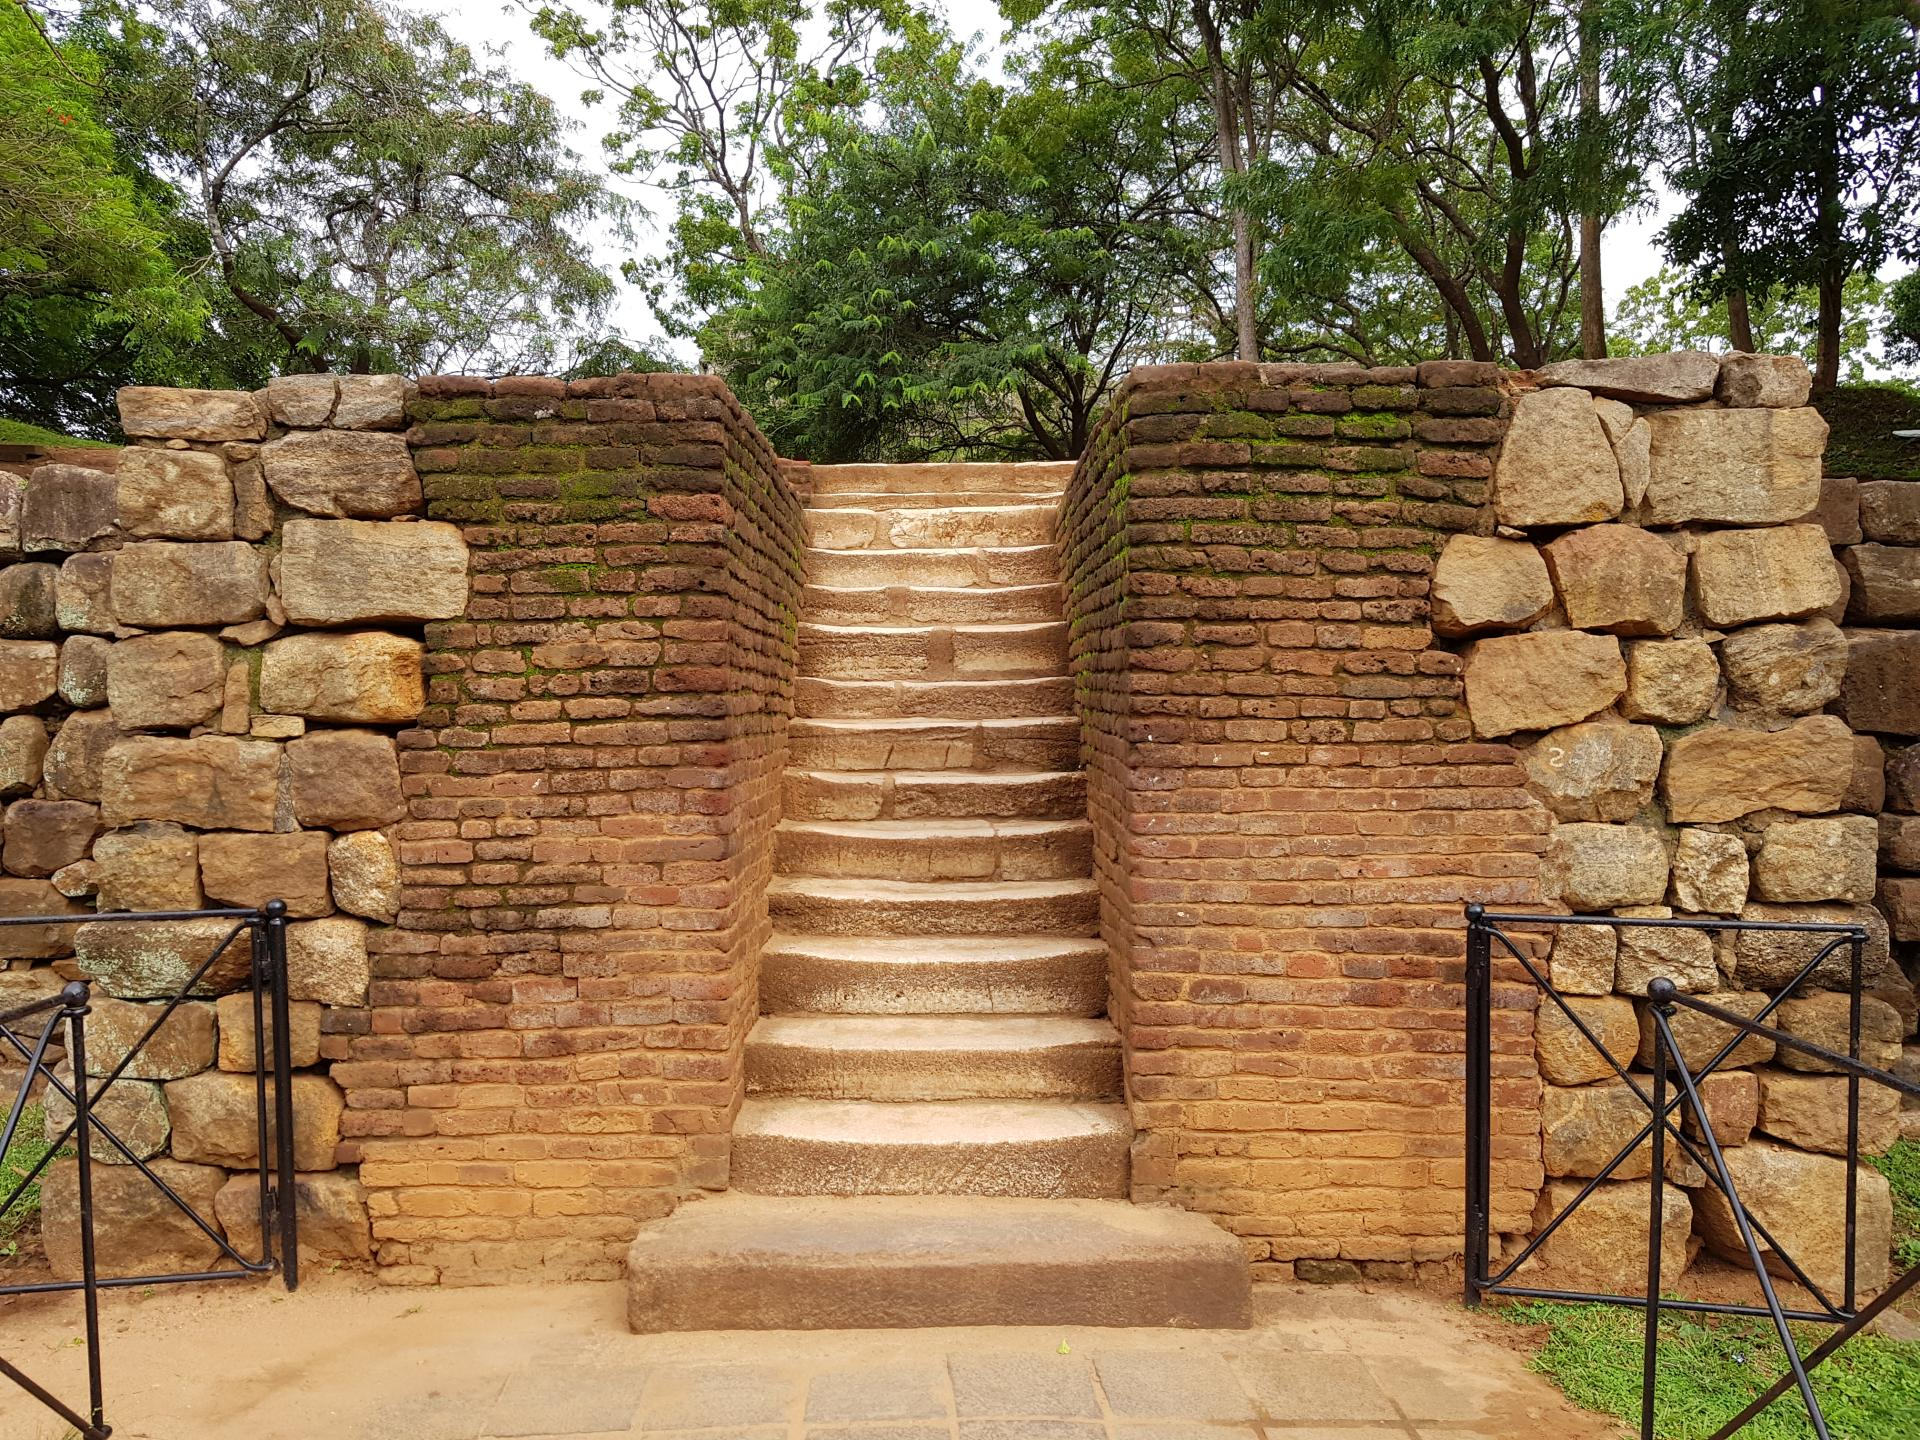 Каменная лестница на центральную аллею в Сигирии, Шри-Ланка